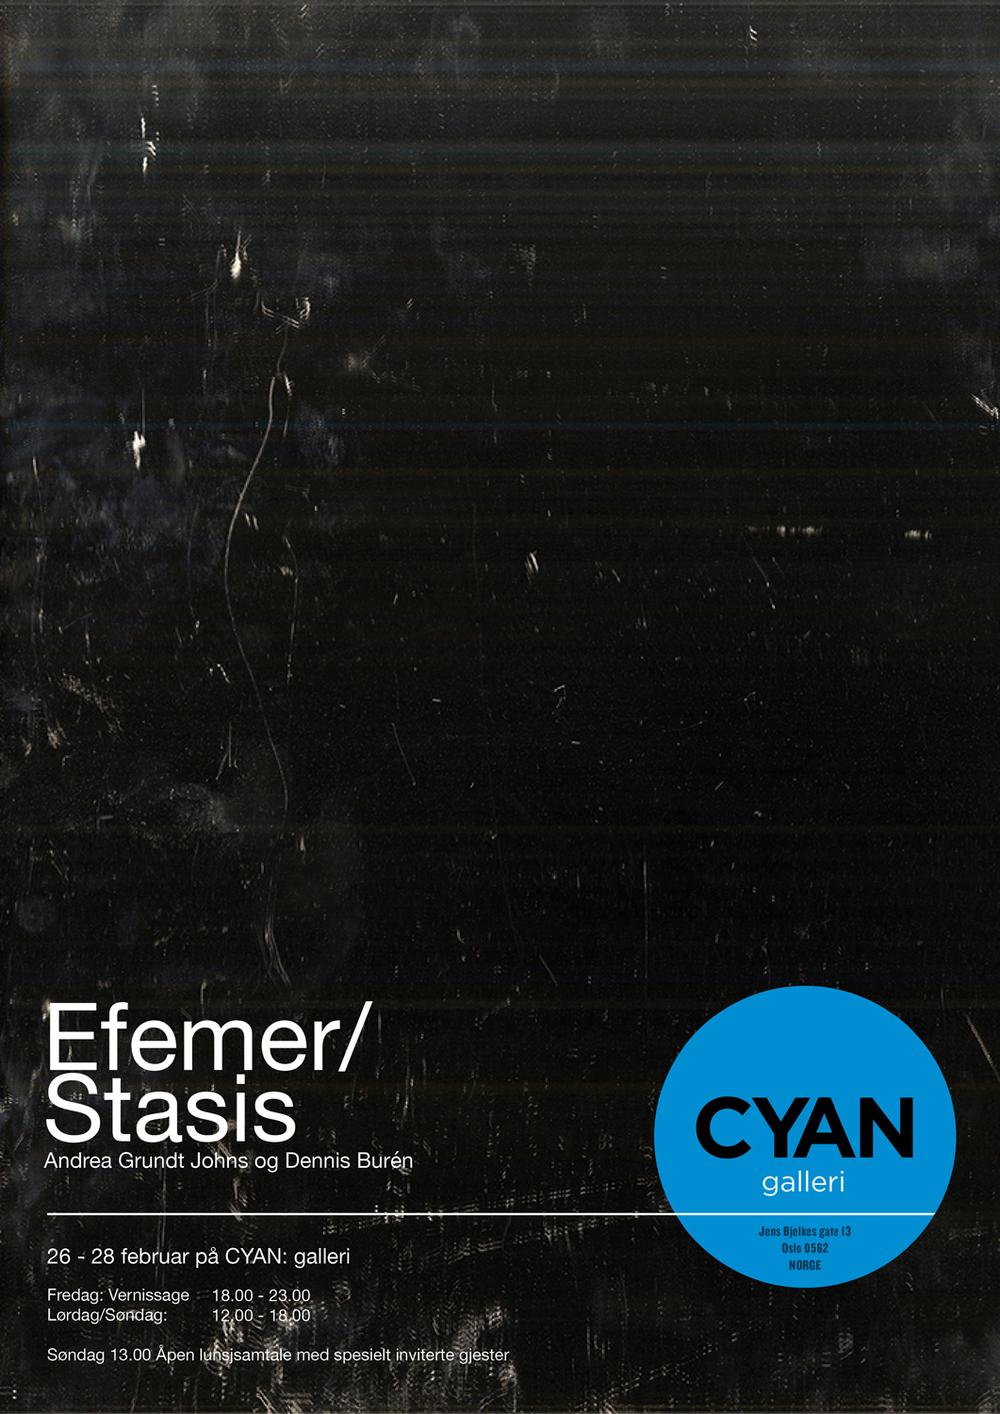 poster_til_pressemelding_efemer_stasis copy.jpg